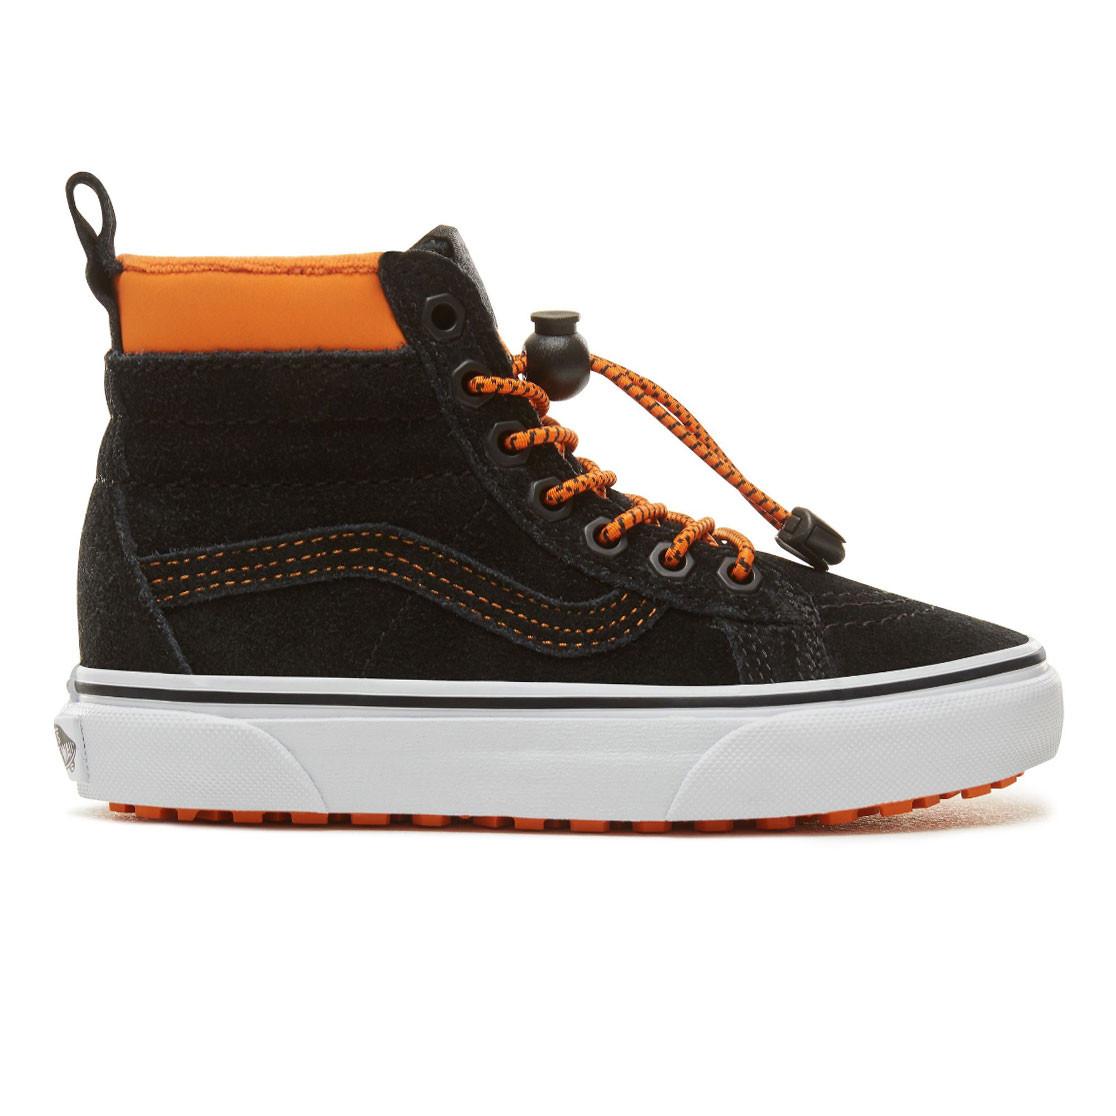 6b87bb74f94c Zľavy Vans Sk8-Hi Mte toggle orange black